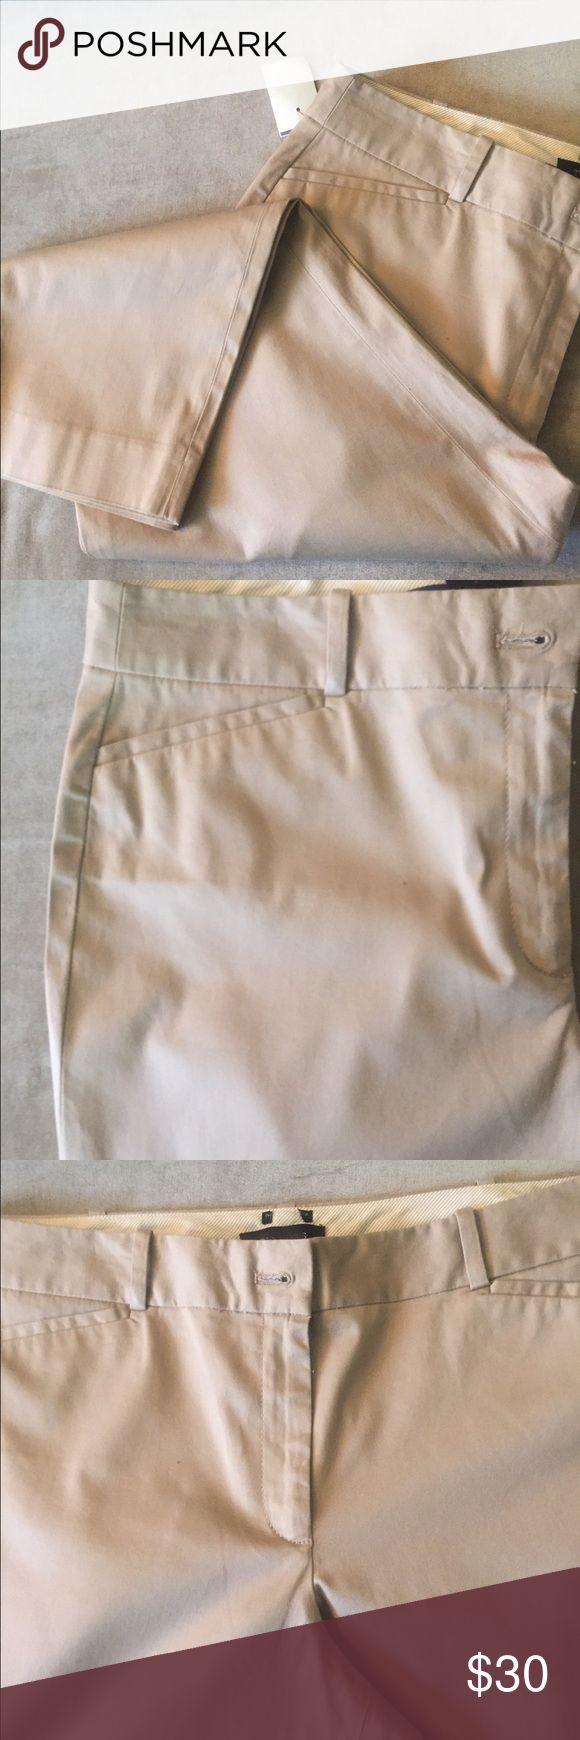 "👀Talbots Khaki Capris New with tag and never worn. Waist 18"" inseam 22"" Talbots Pants Capris"